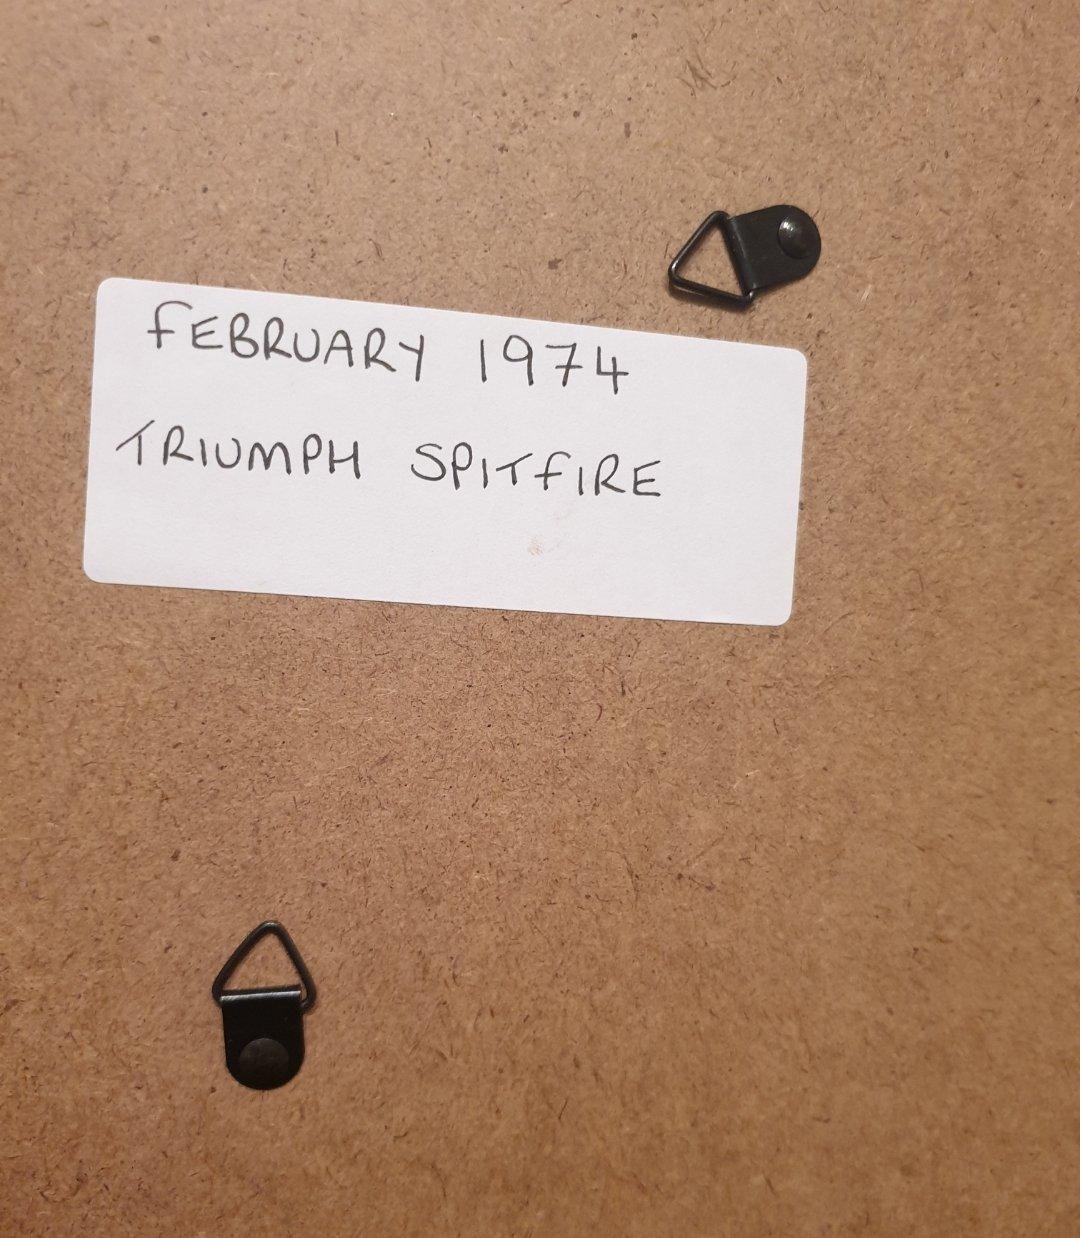 Original 1974 Triumph Spitfire Framed Advert For Sale (picture 2 of 3)